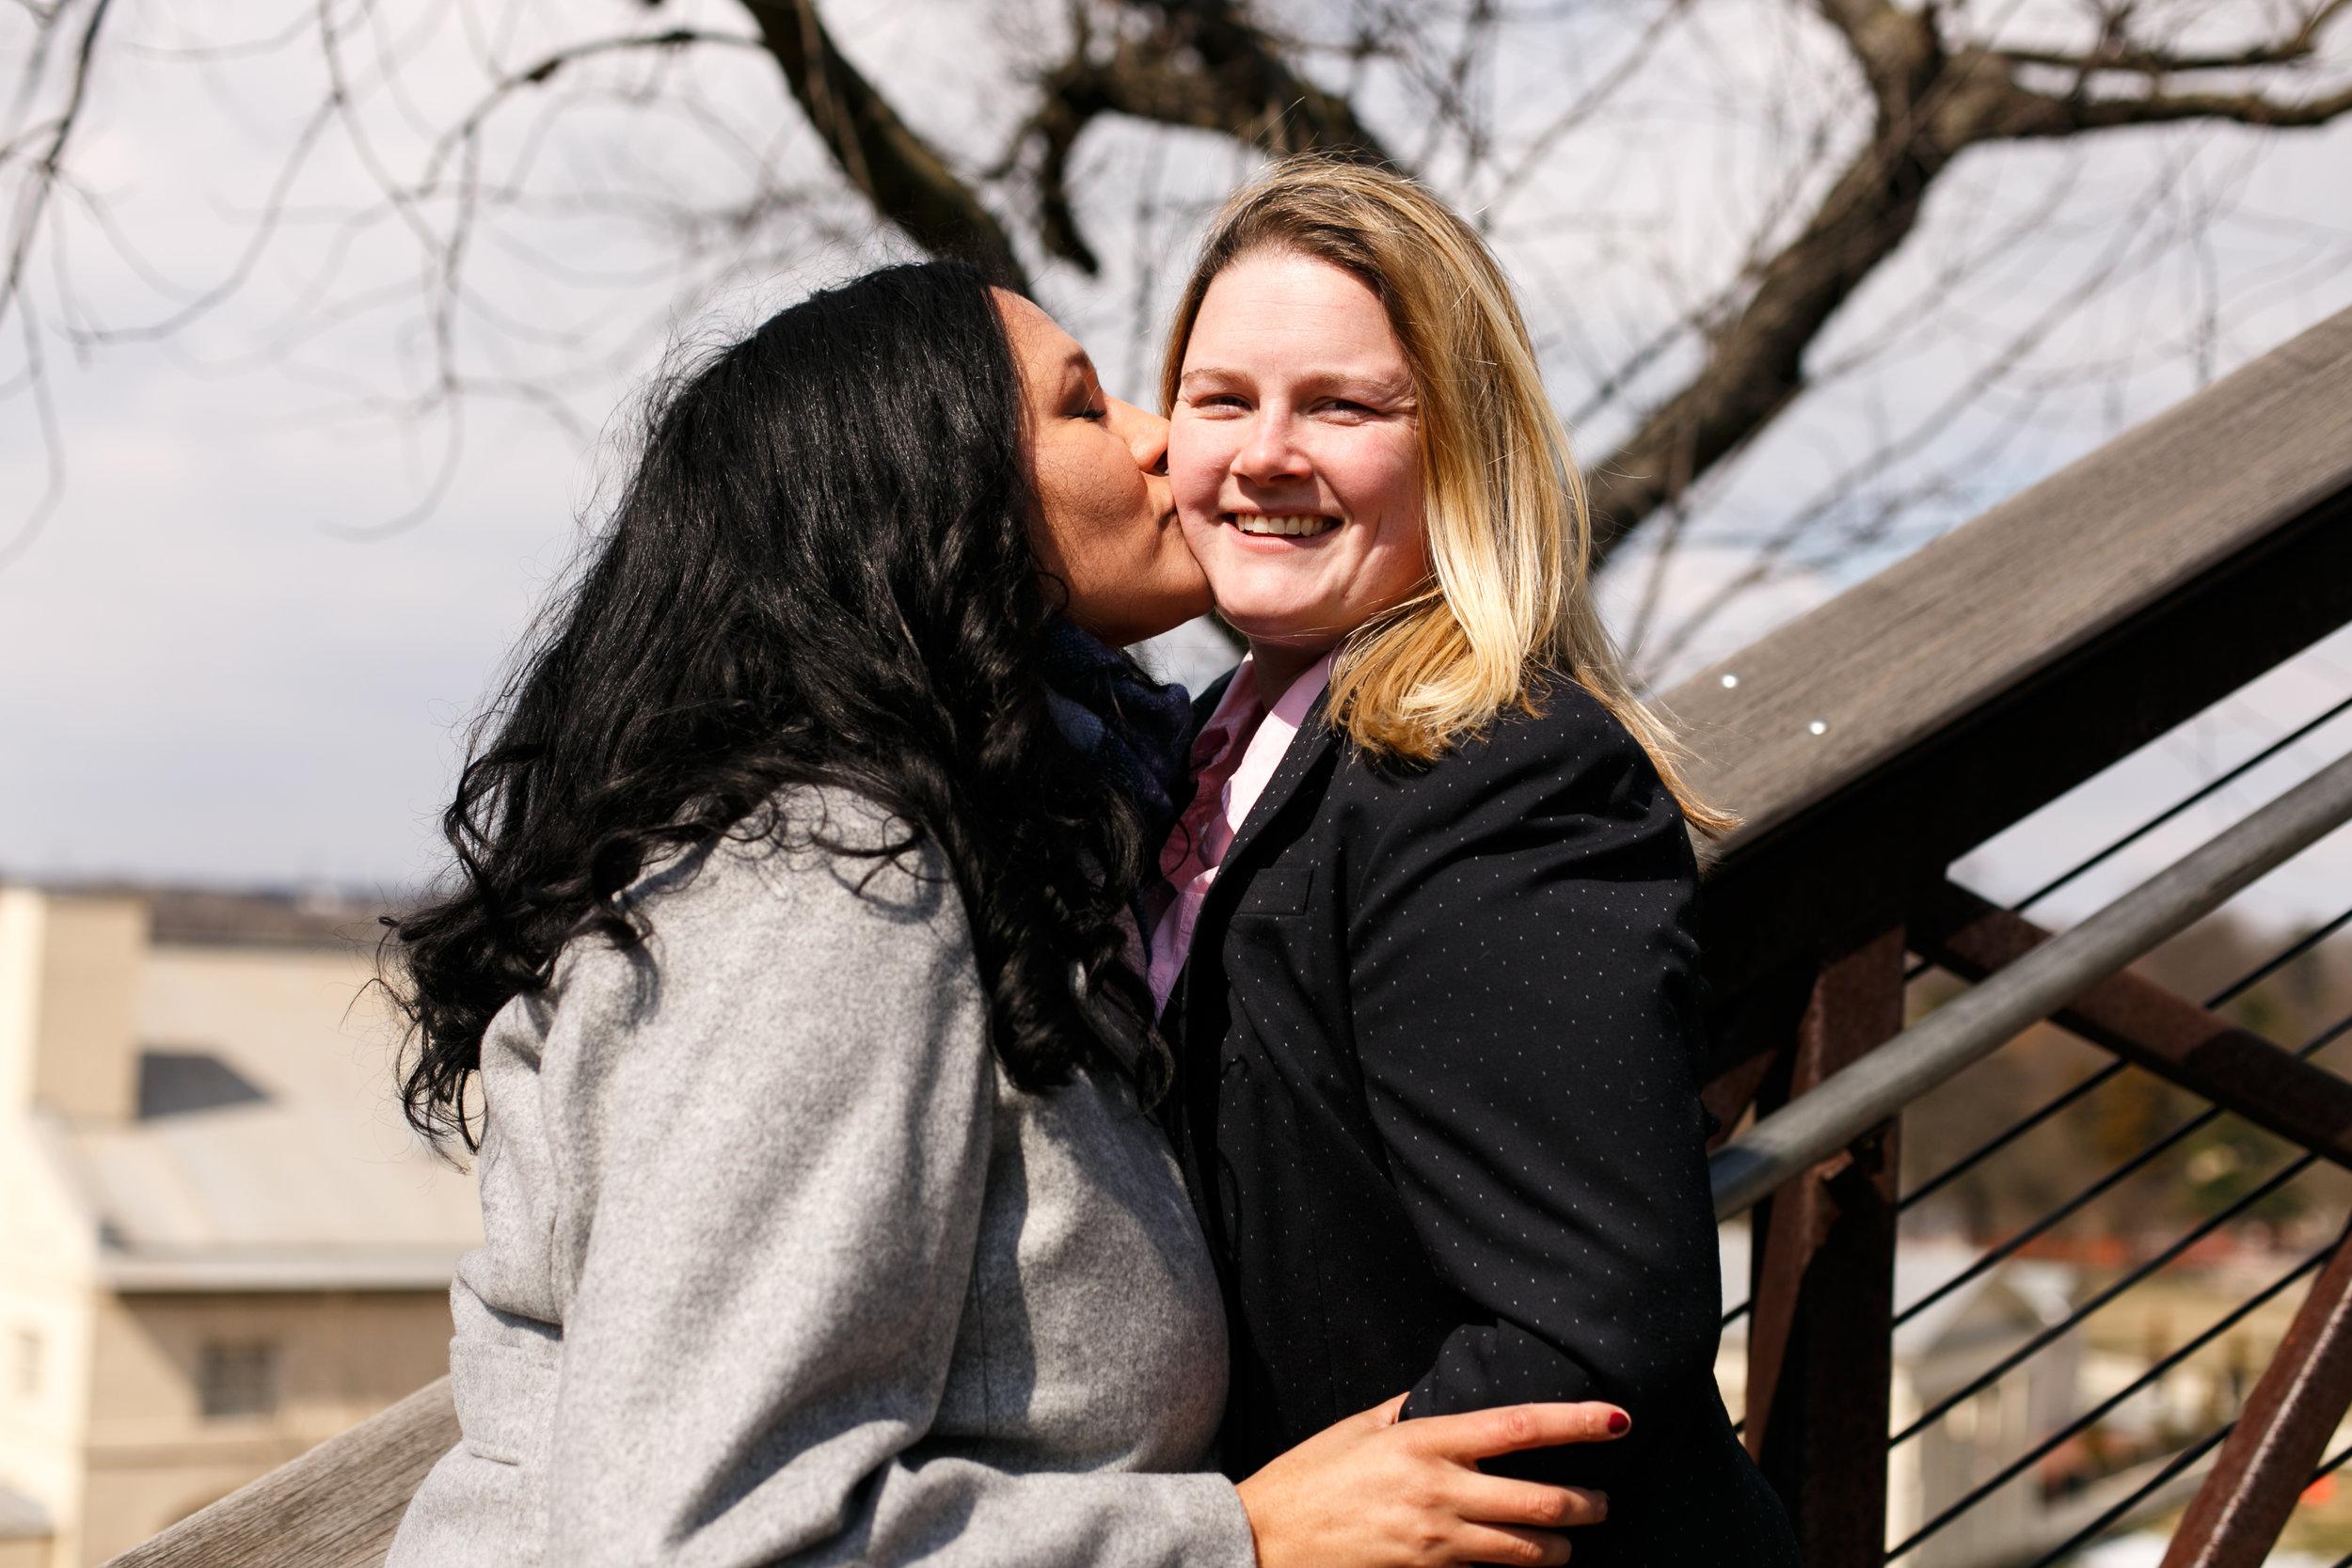 Layla and Meg Philadelphia LGBTQ Engagement Shoot-42.jpg